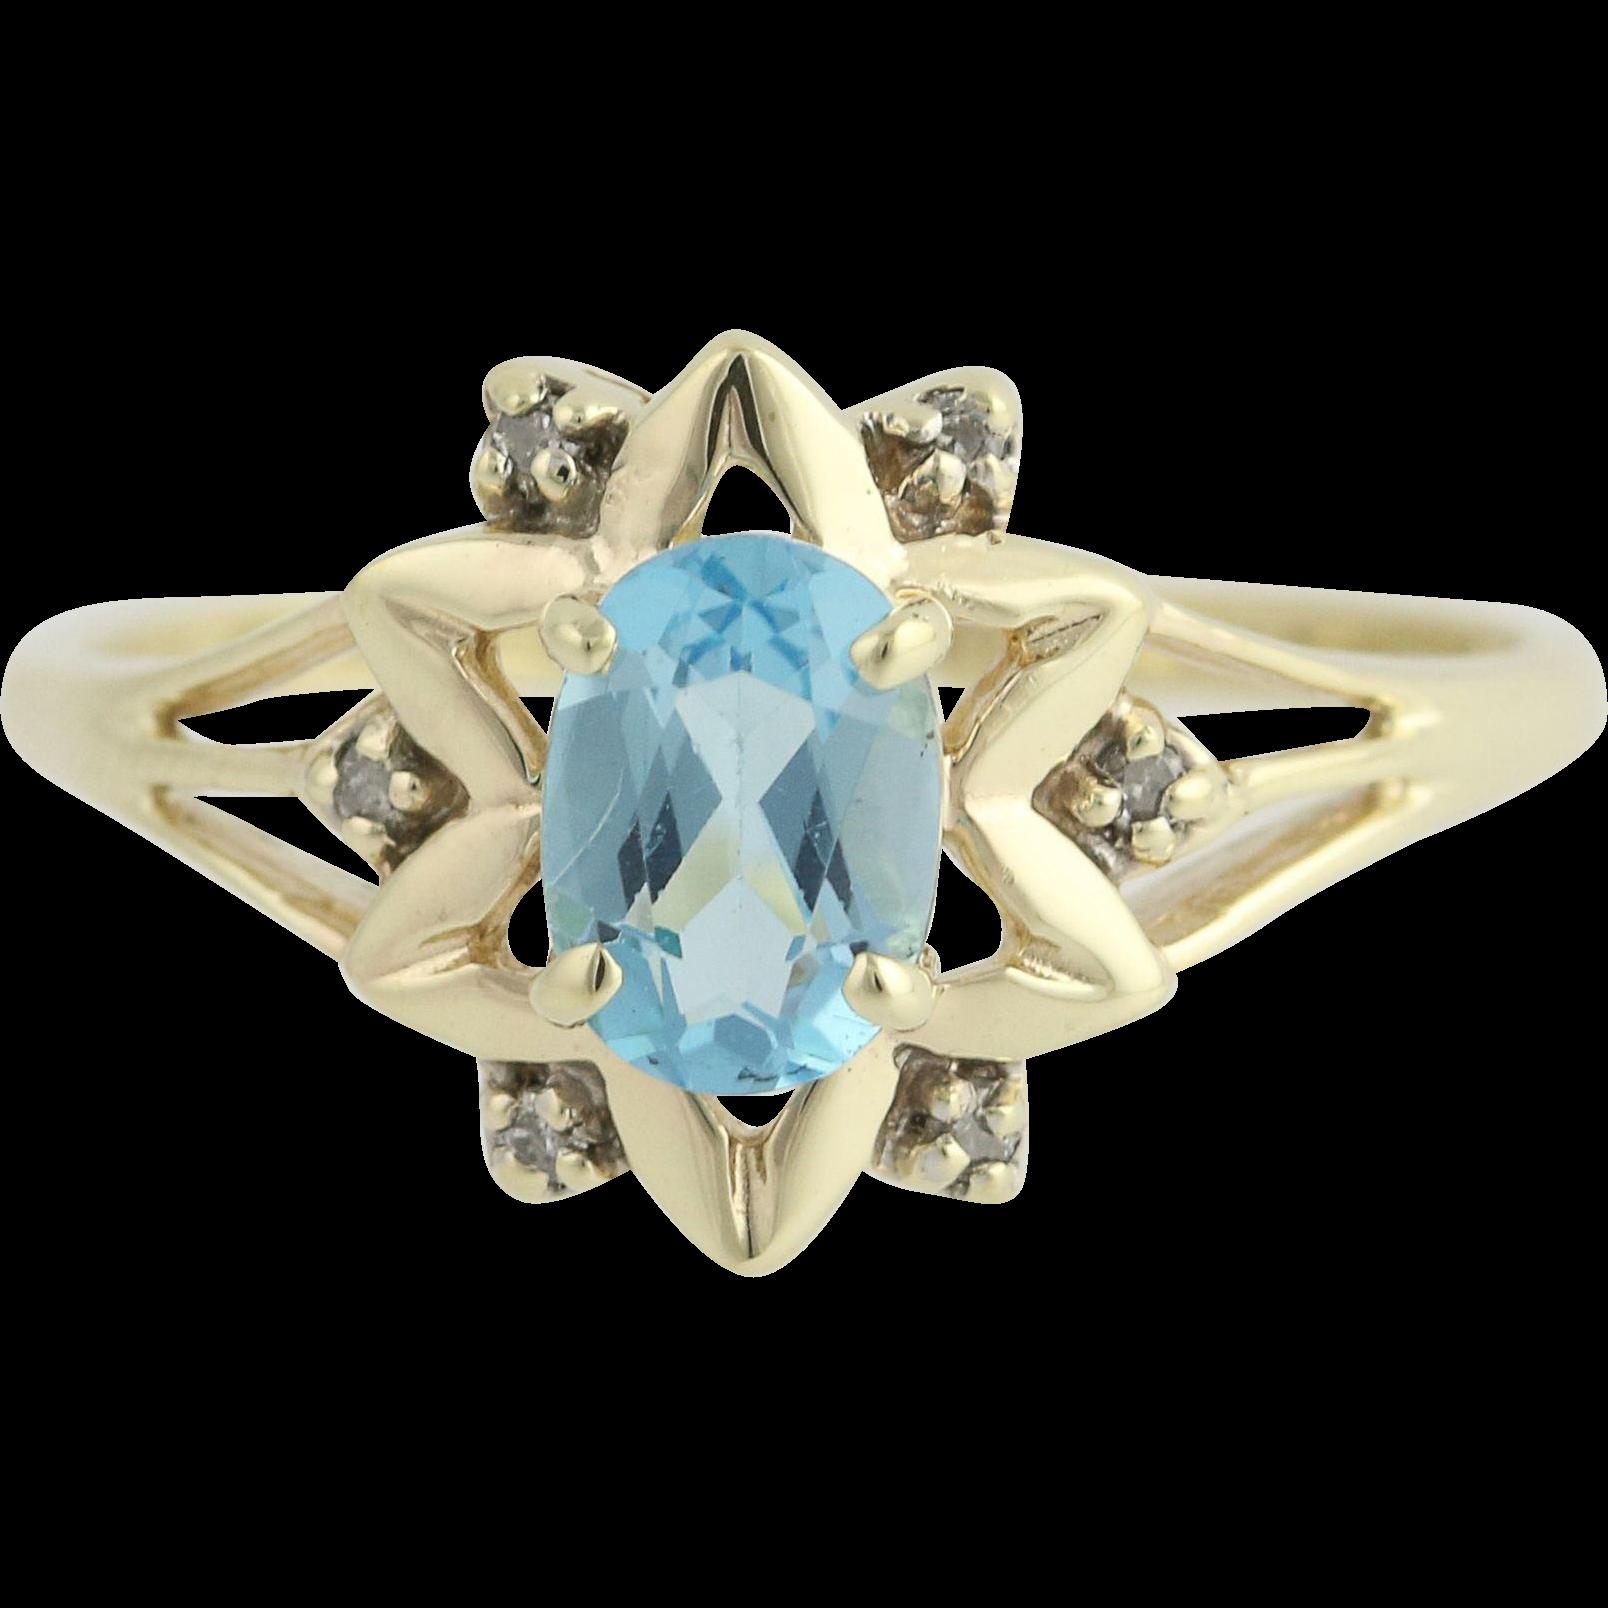 Blue Topaz & Diamond Star Ring - 10k Yellow & White Gold 1.00ctw